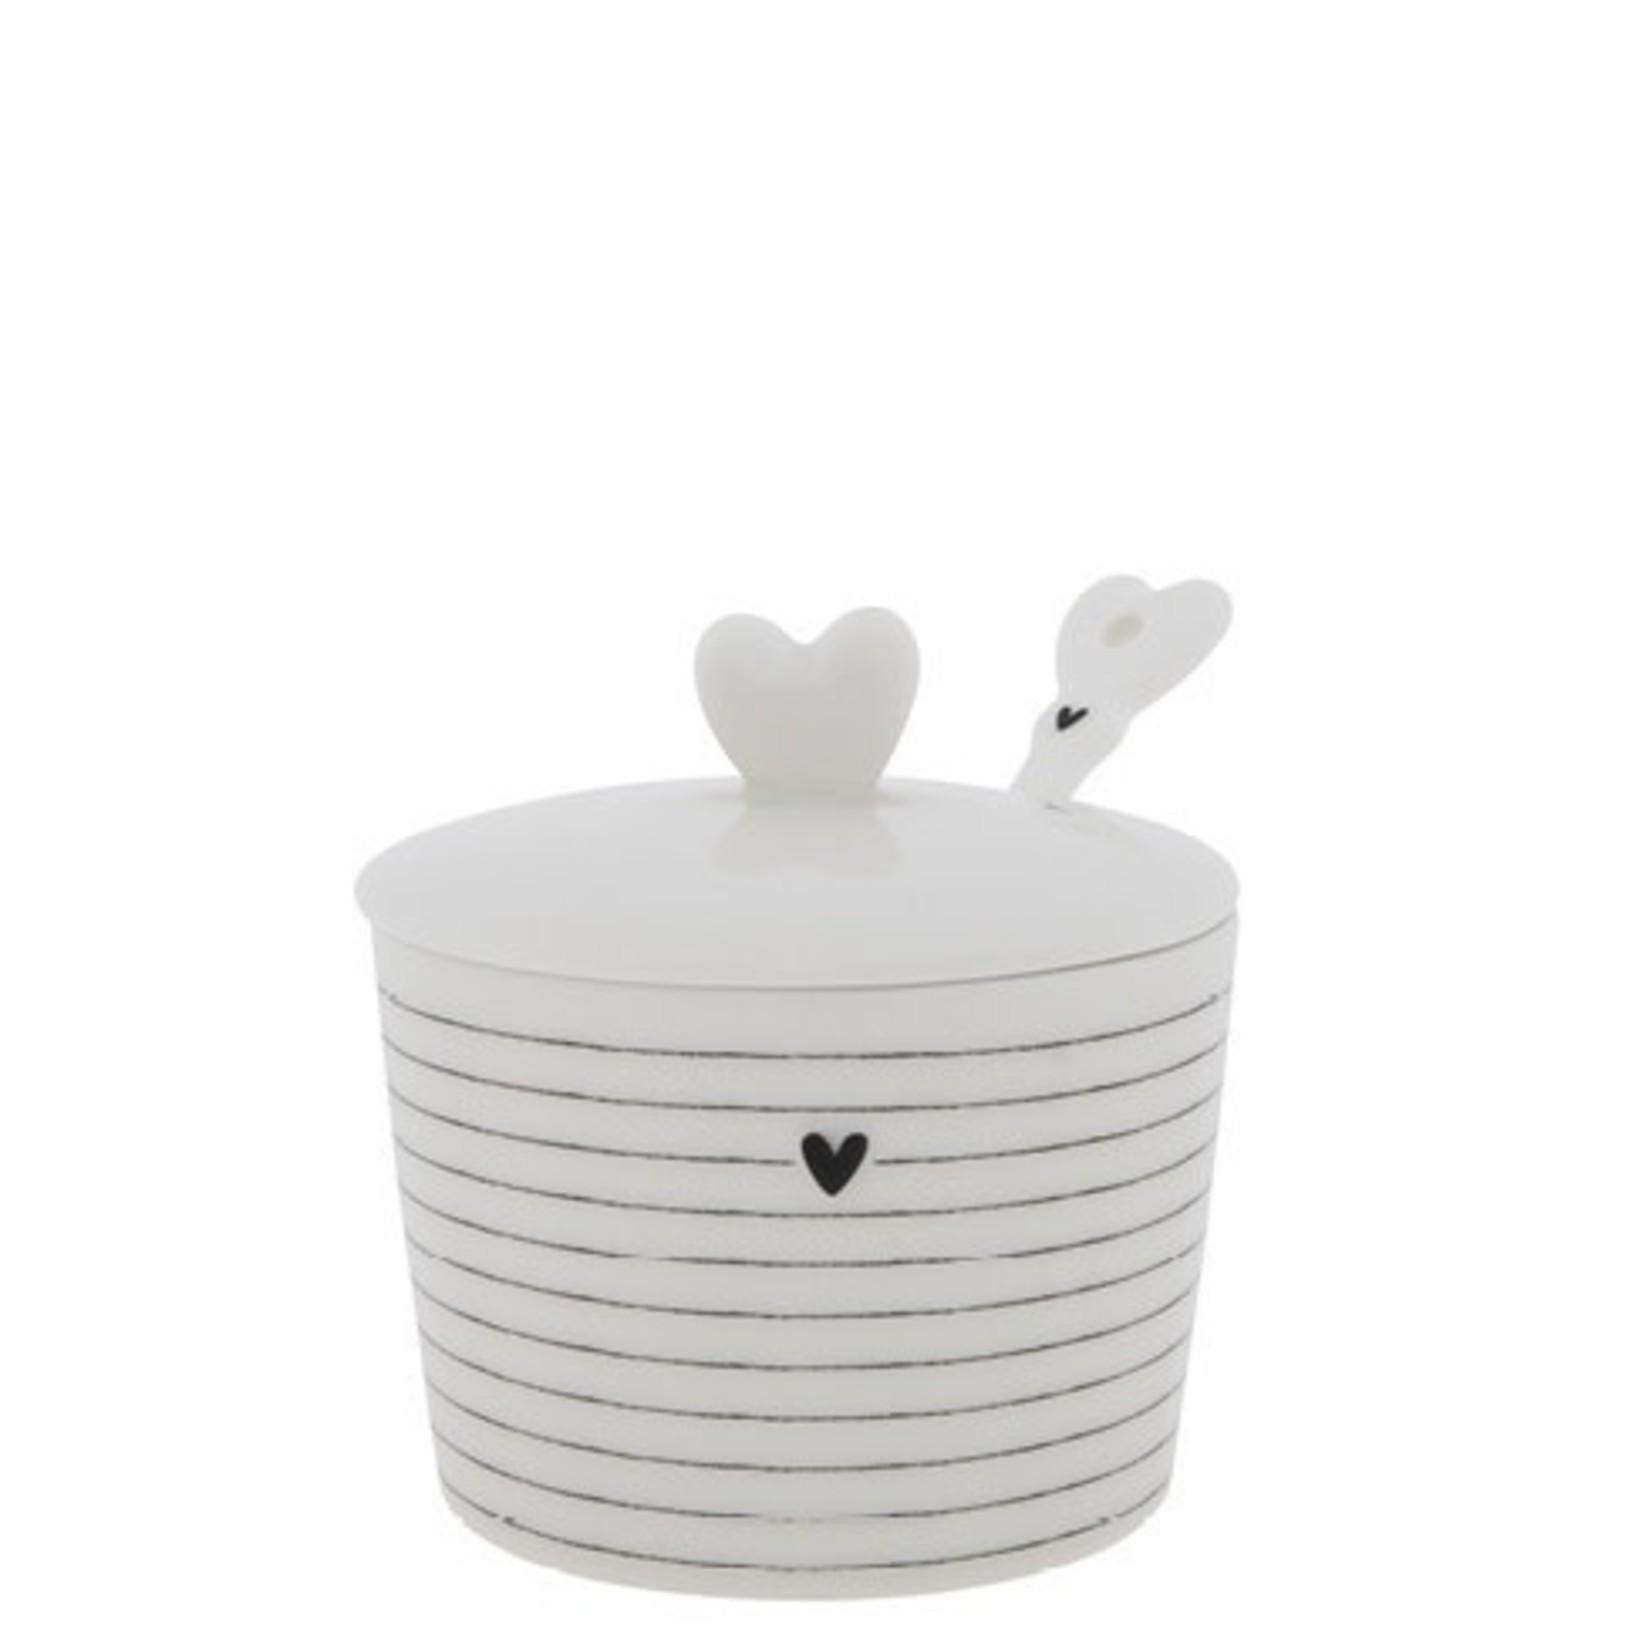 Bastion Collections Sugar Bowl stripes/heart white/black7x8.5x7 cm